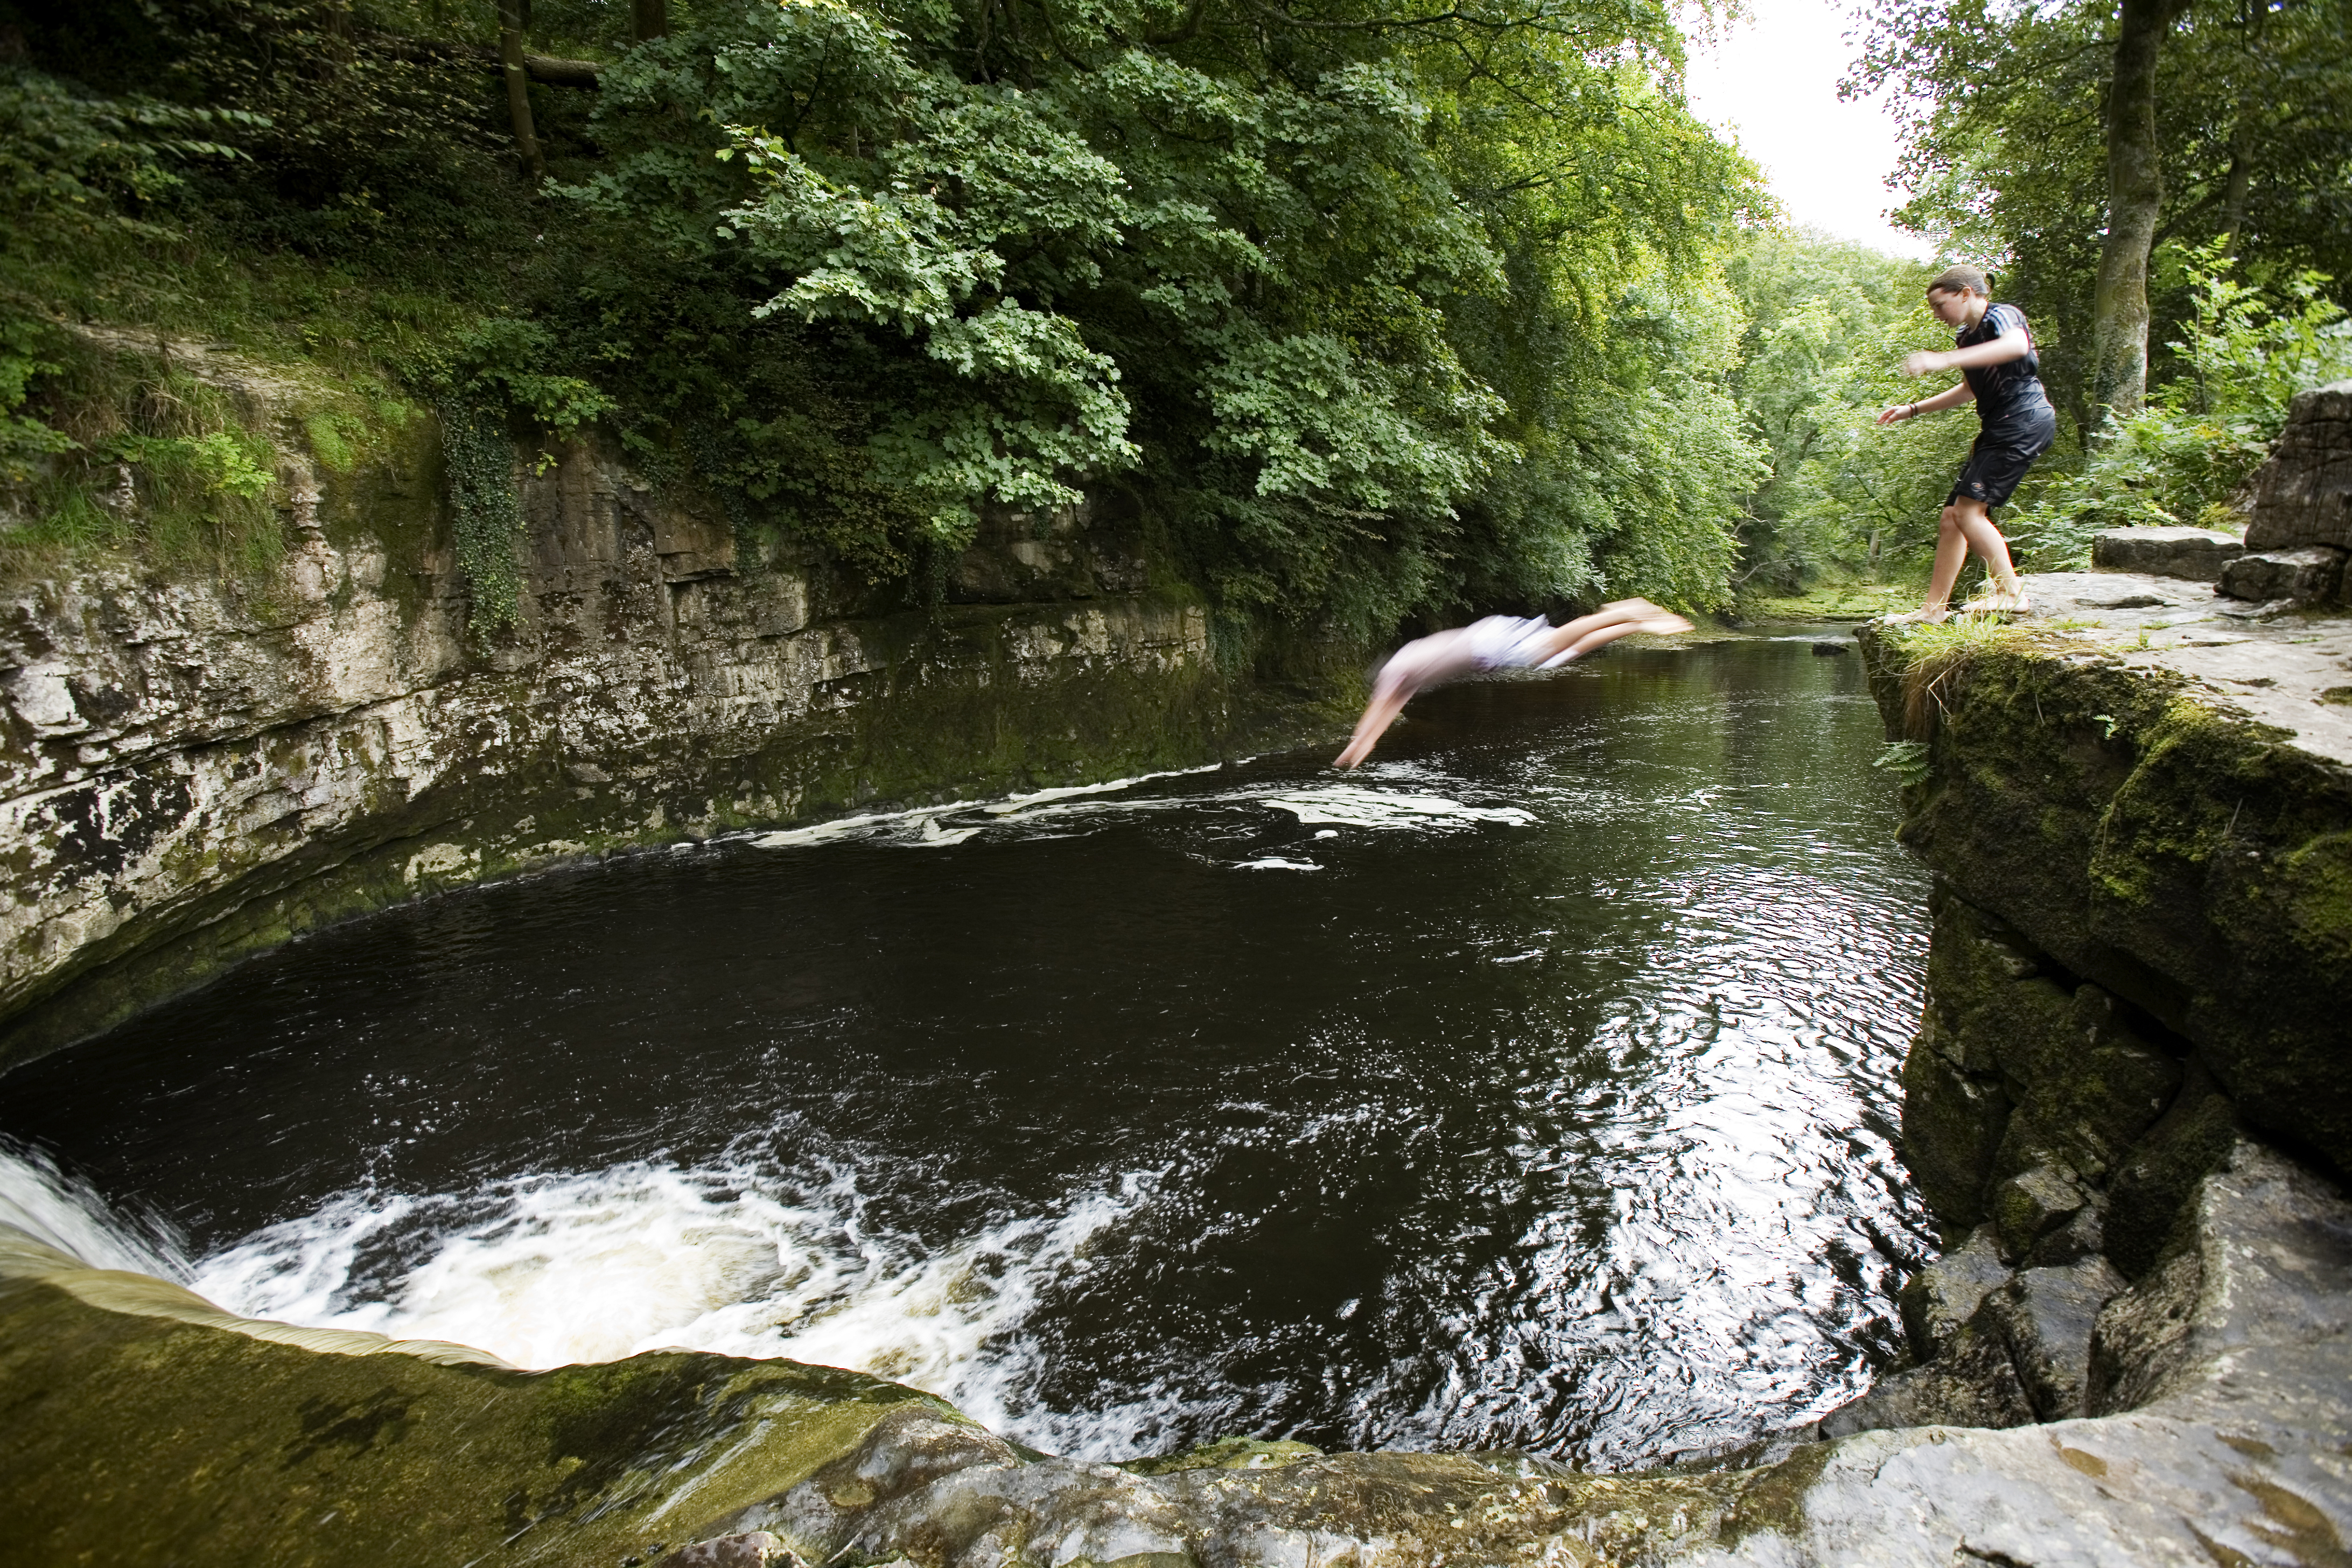 Do not swim against the stream, do not swim with the stream, swim where you want 69